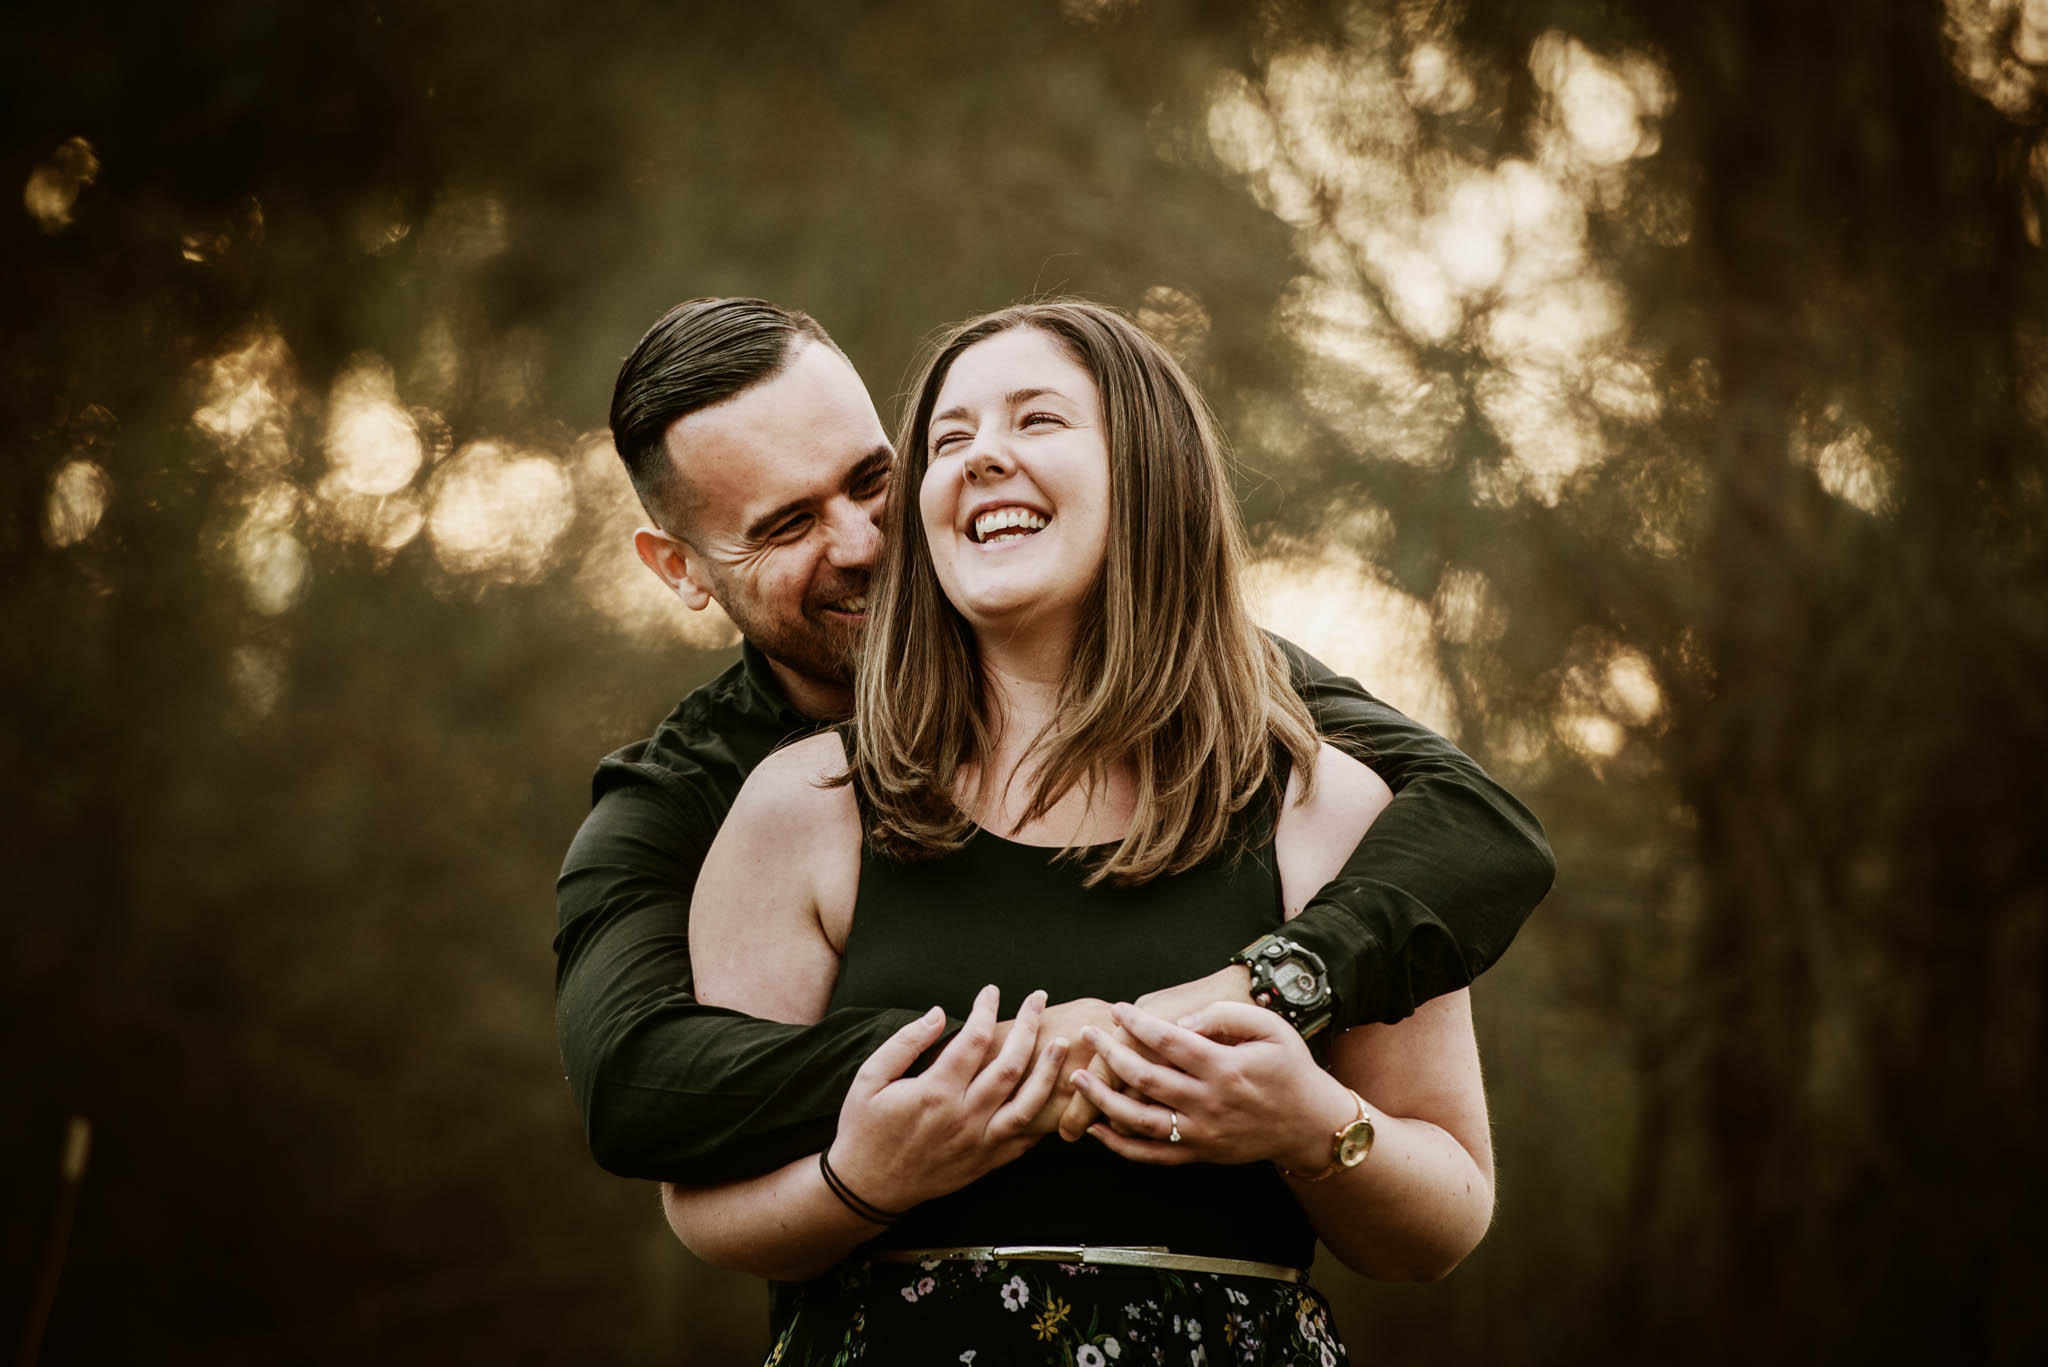 launceston couples photographer-1.jpg